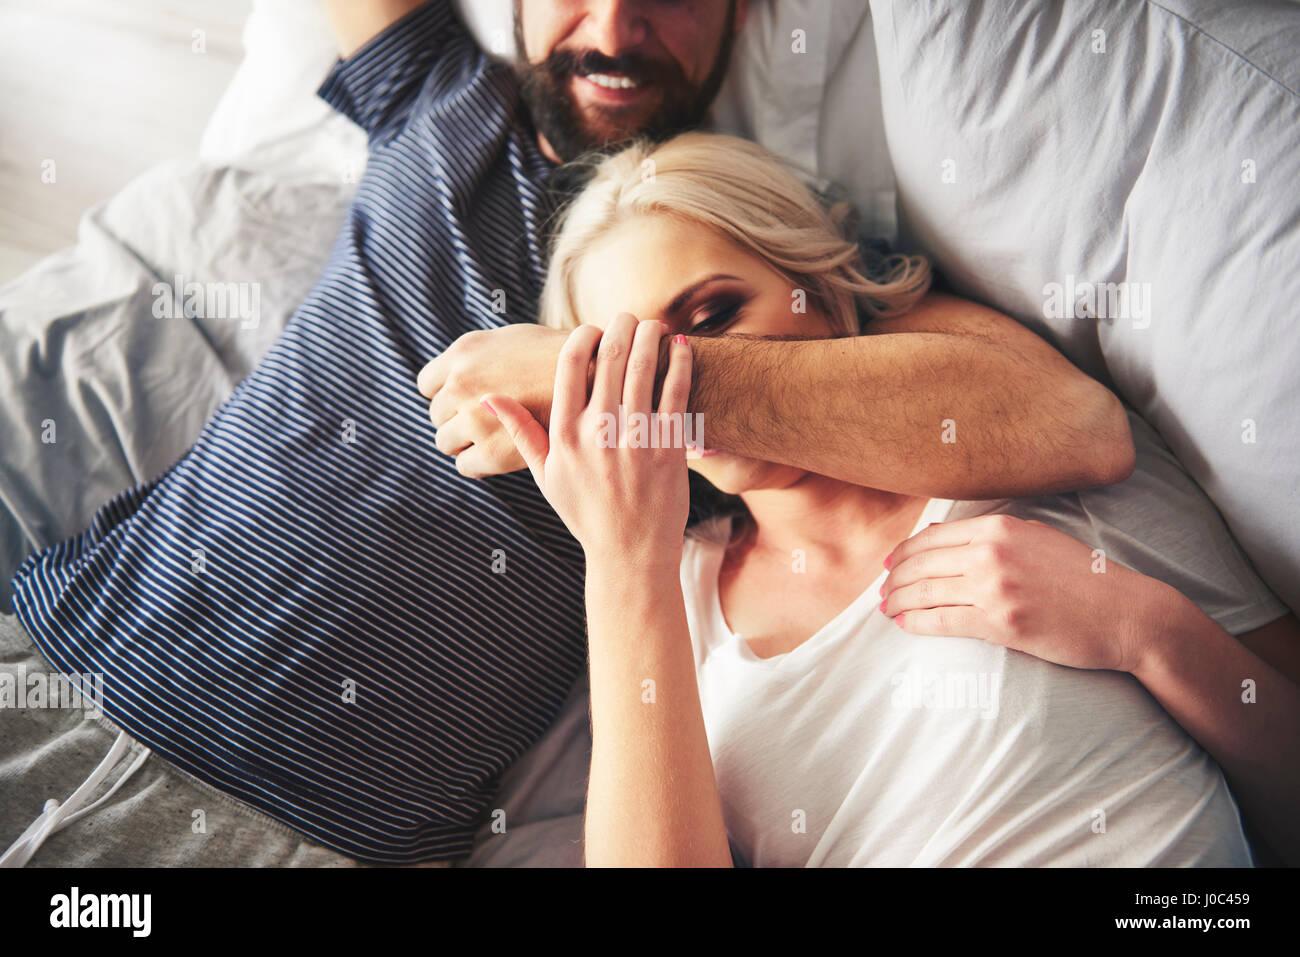 Paar, entspannend auf Bett, herumalbern Stockbild